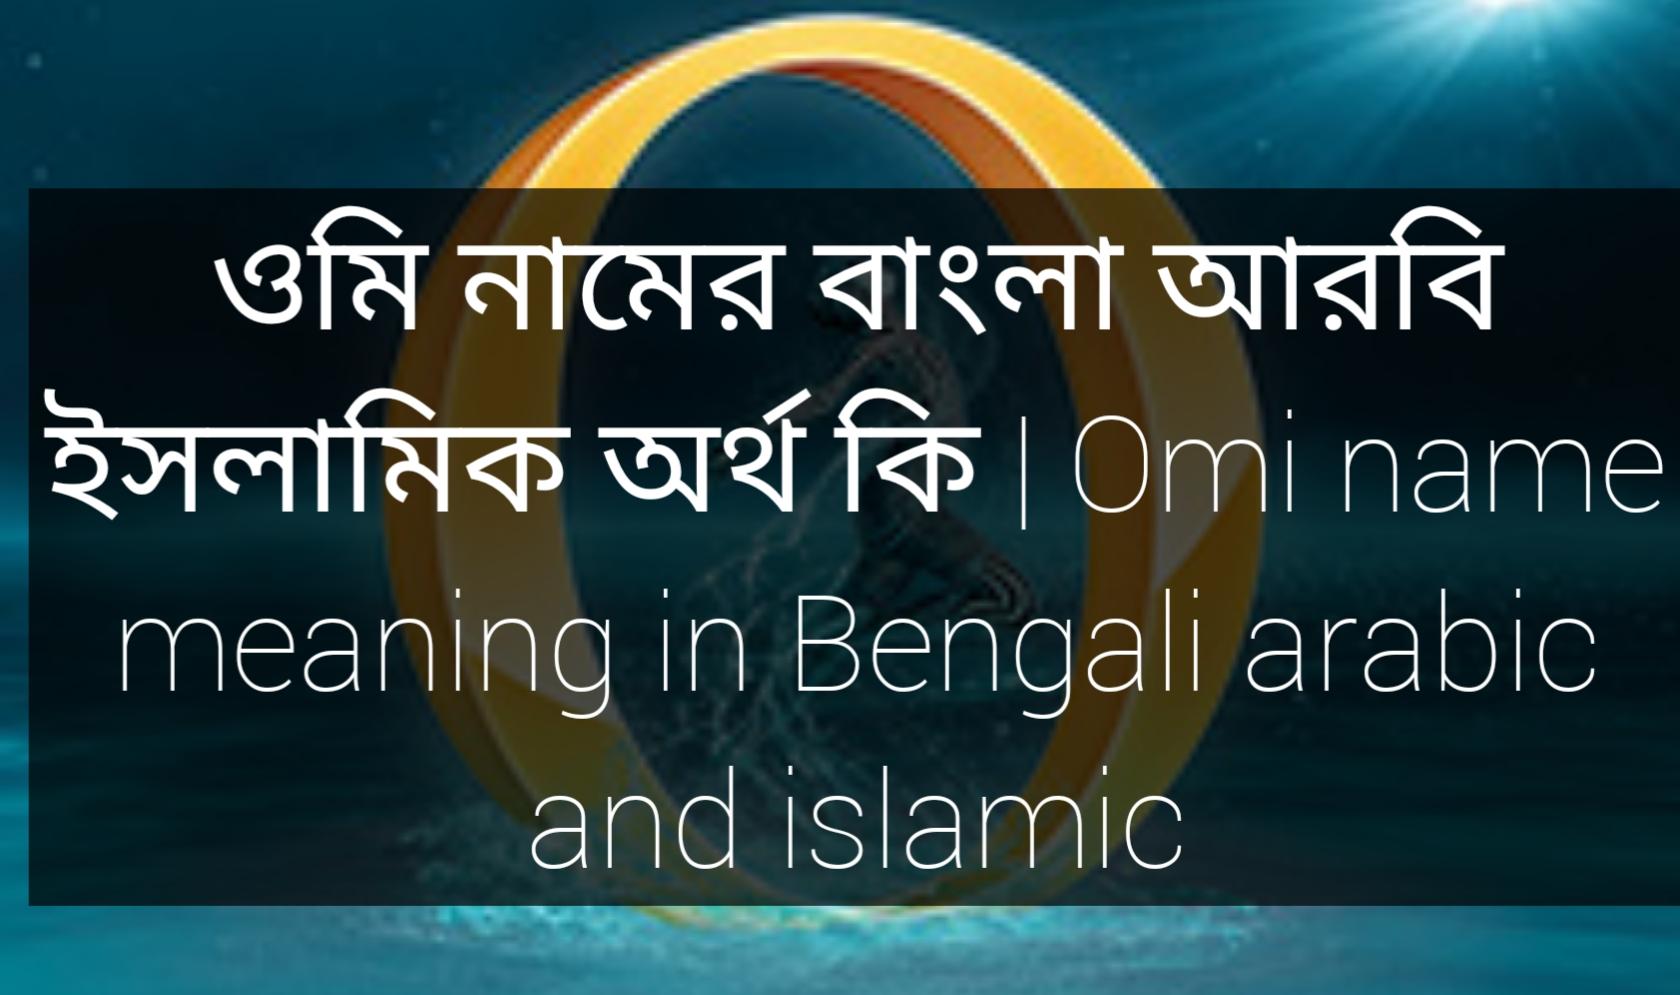 Omi name meaning in Bengali, ওমি নামের অর্থ কি, ওমি নামের বাংলা অর্থ কি, ওমি নামের ইসলামিক অর্থ কি,